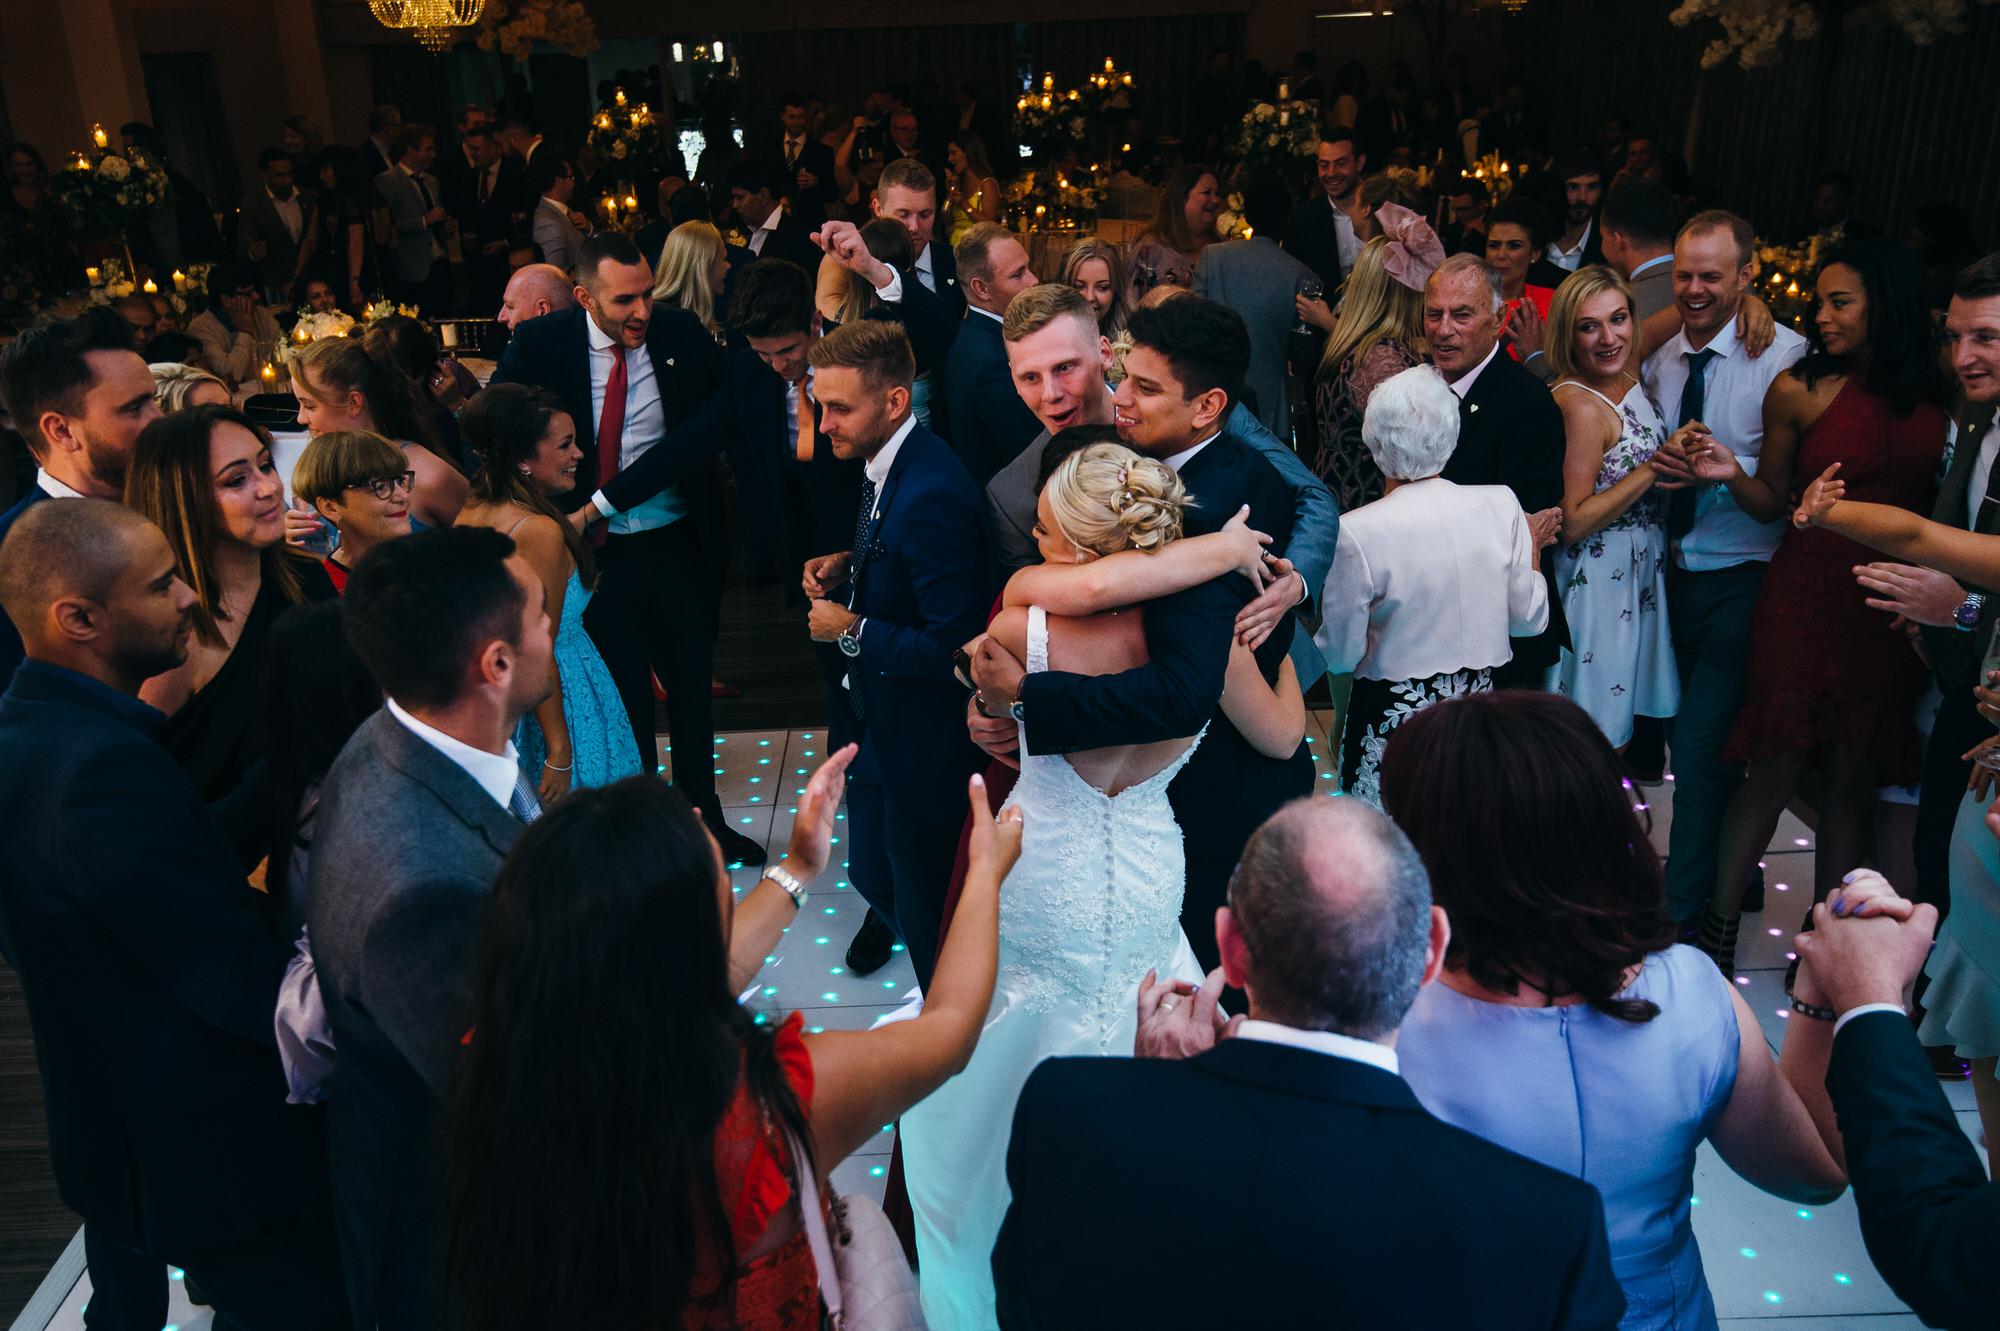 Merrydale manor wedding photography 098